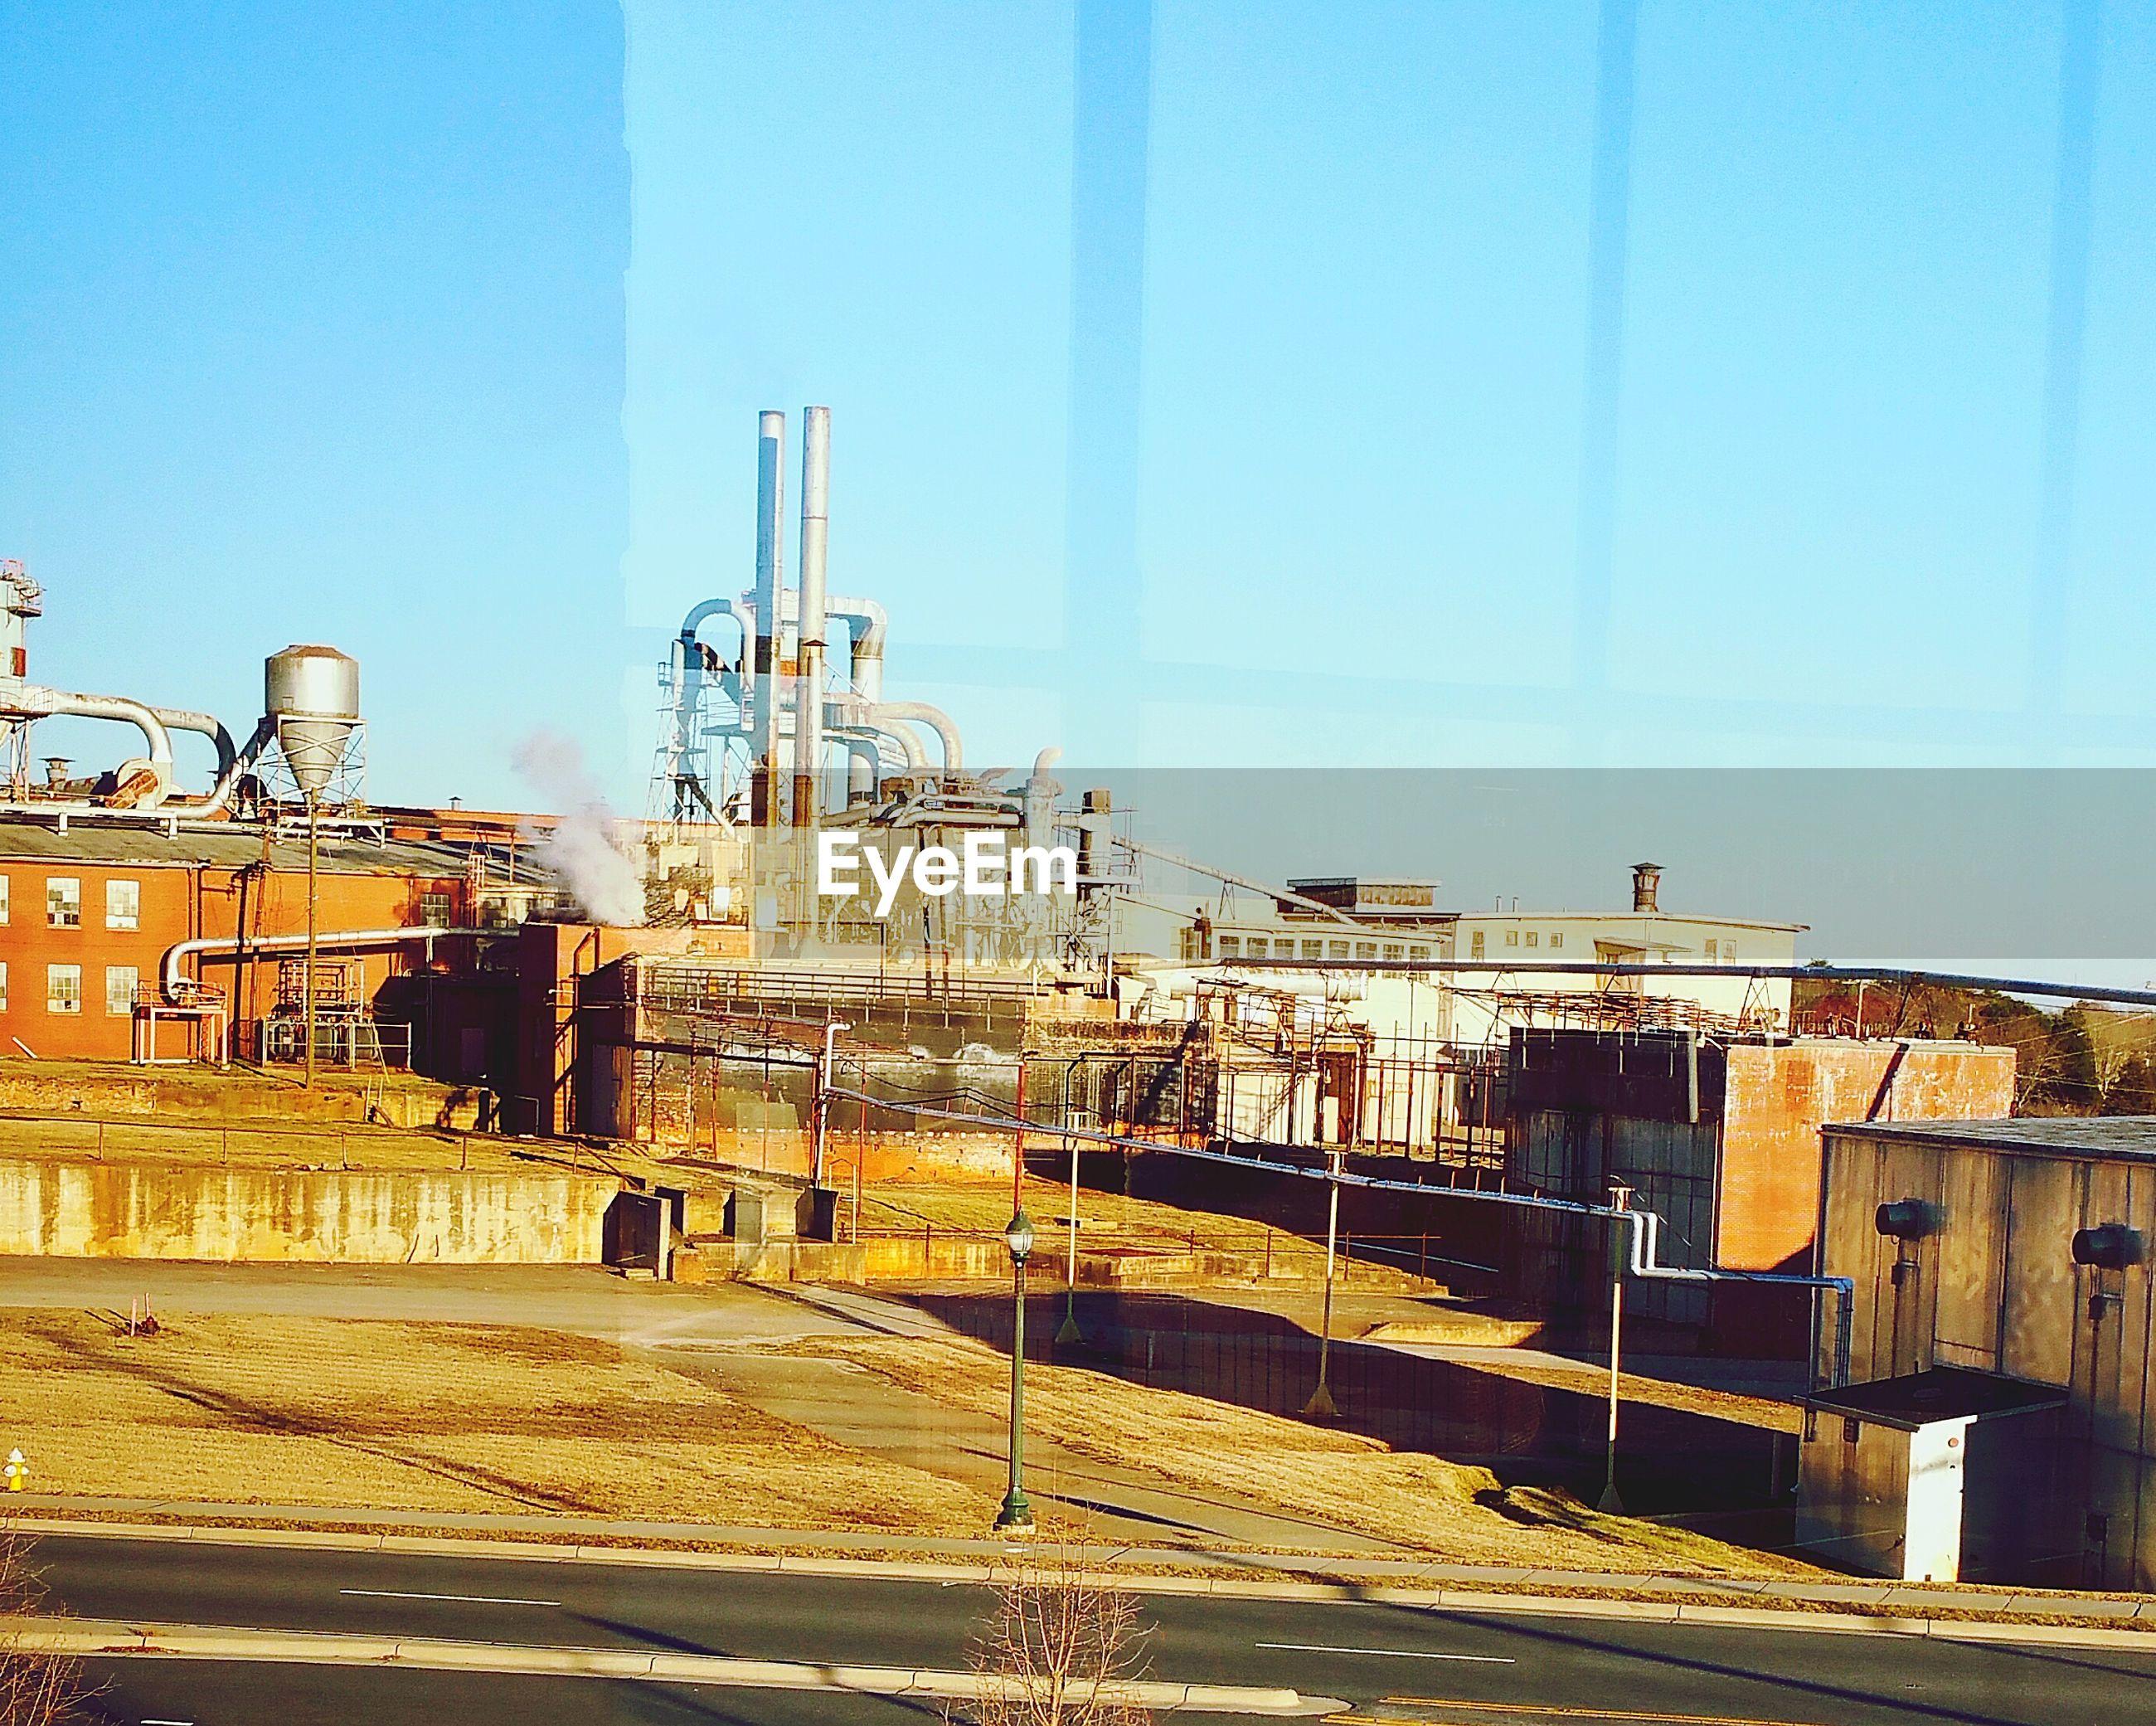 Industrial building against clear sky seen through window